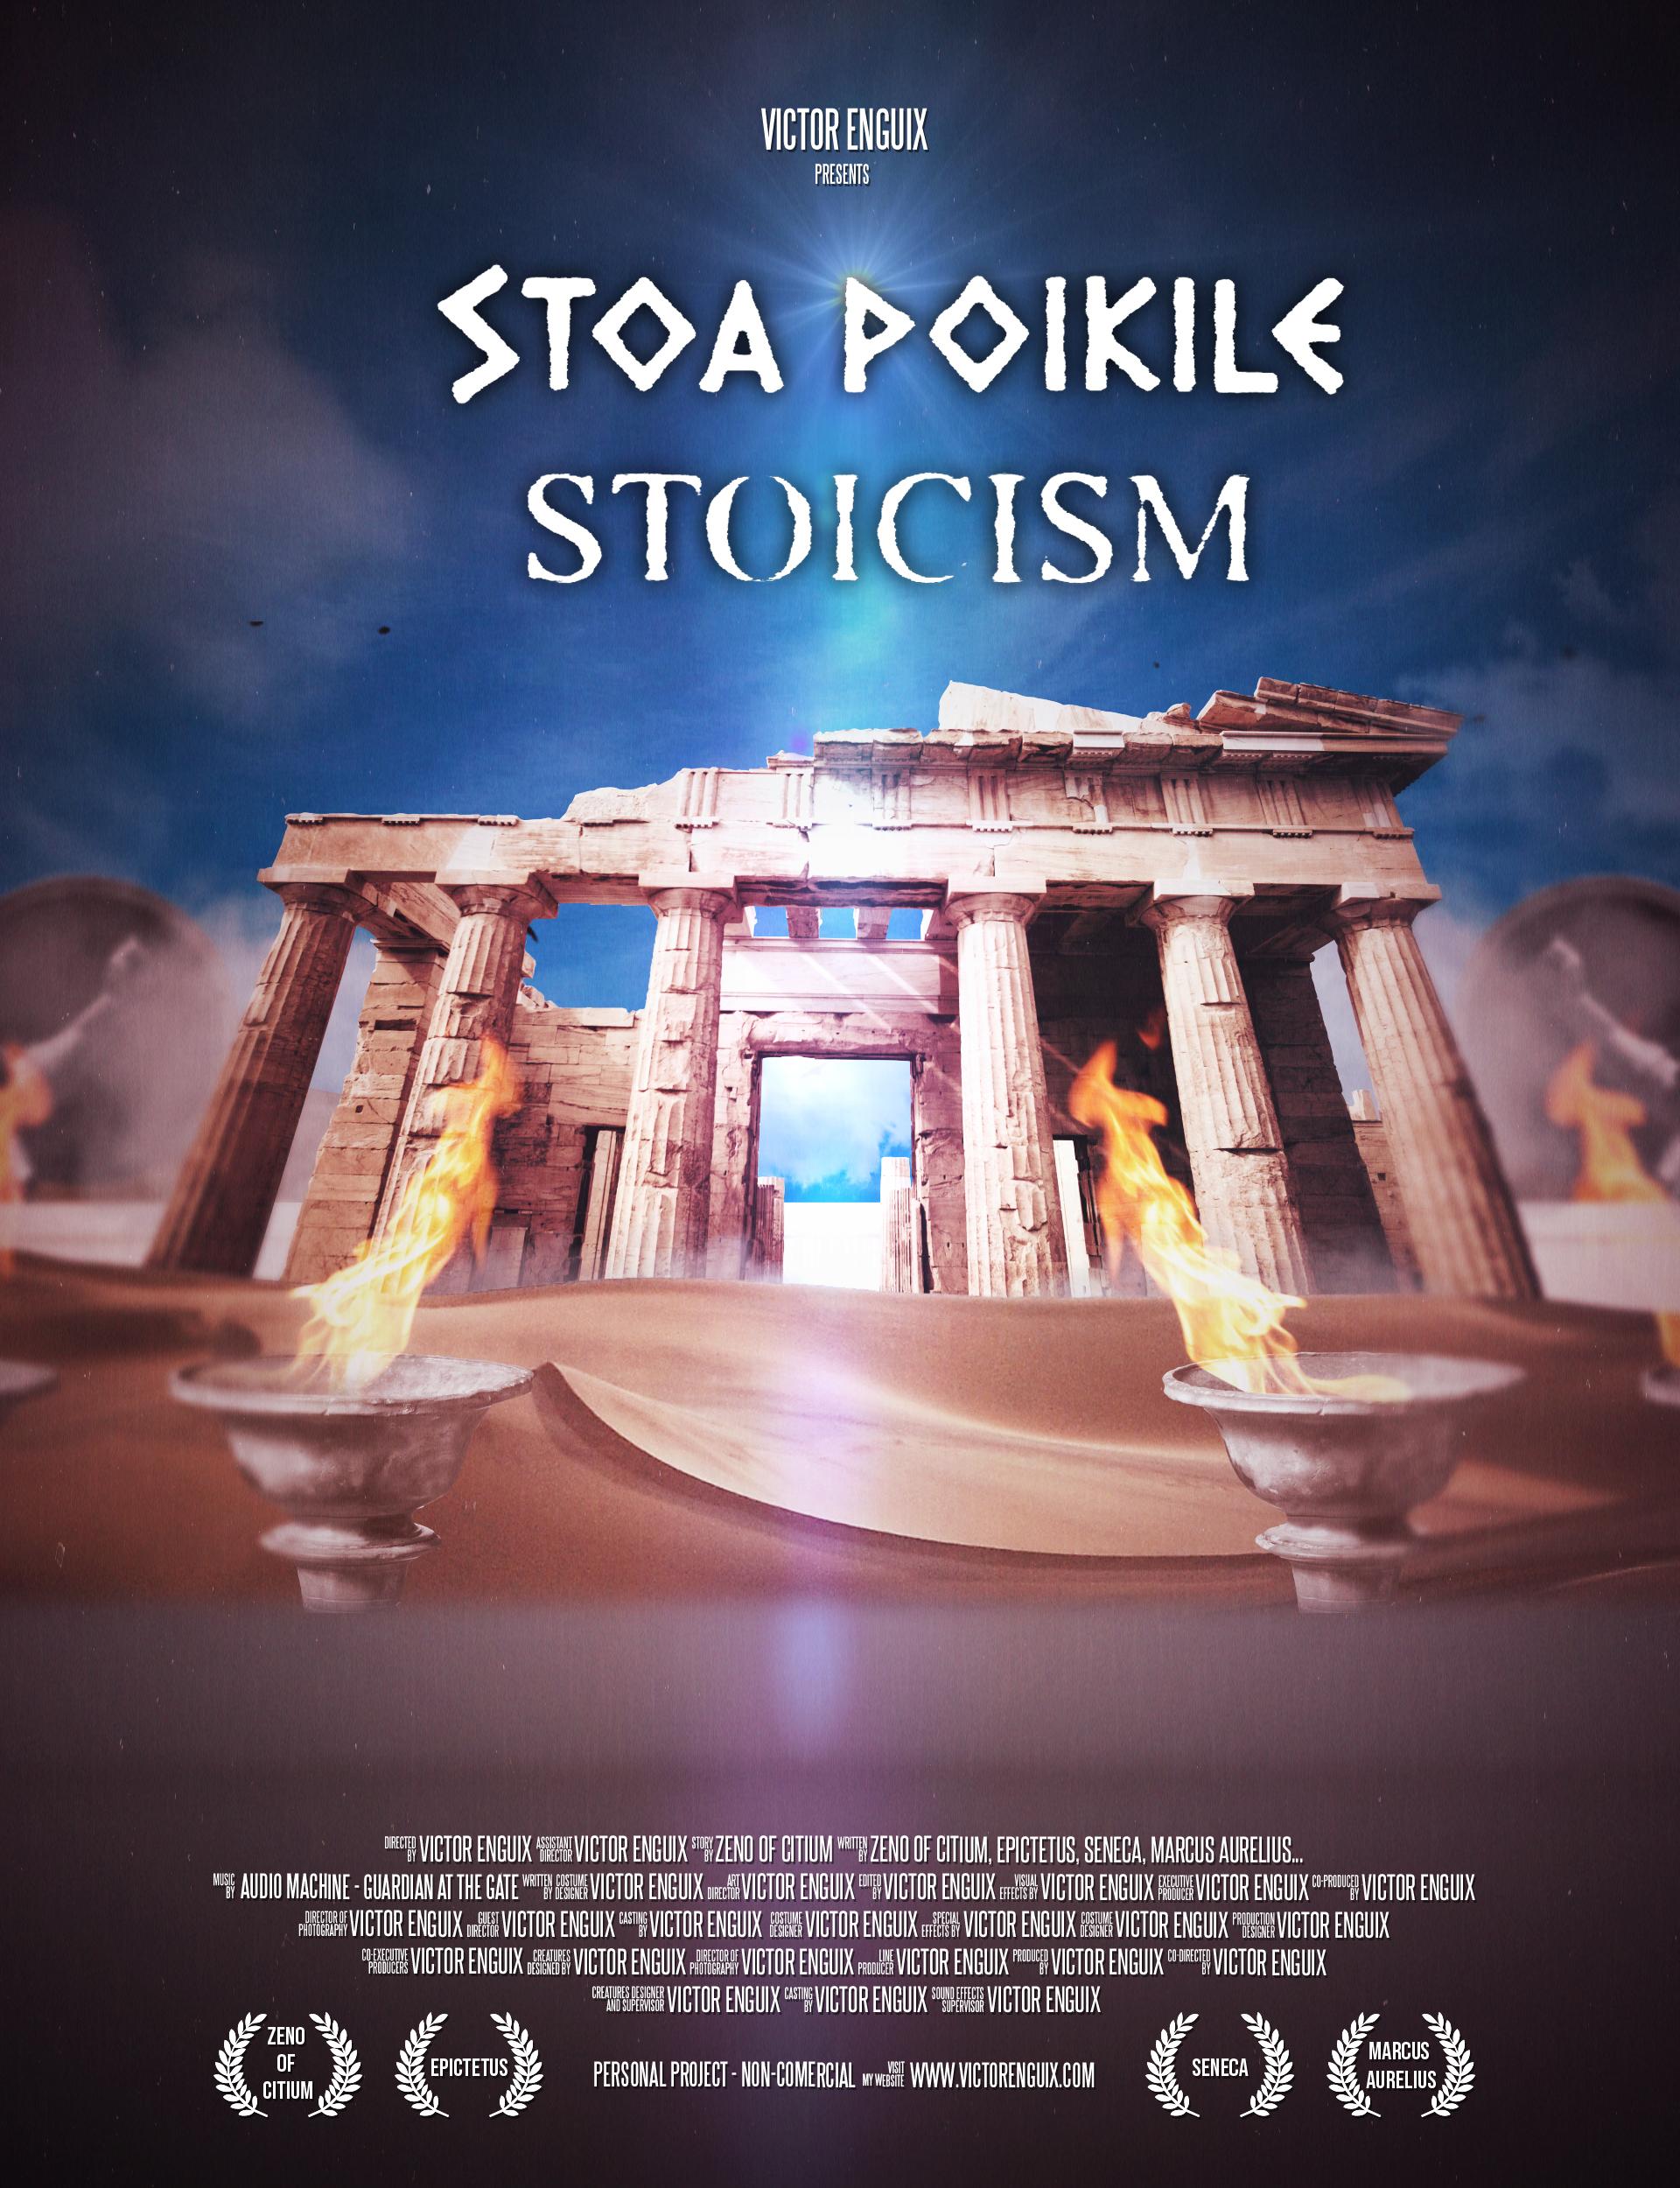 victor_enguix_motion_madrid_creativo_stoicism_poster.jpg